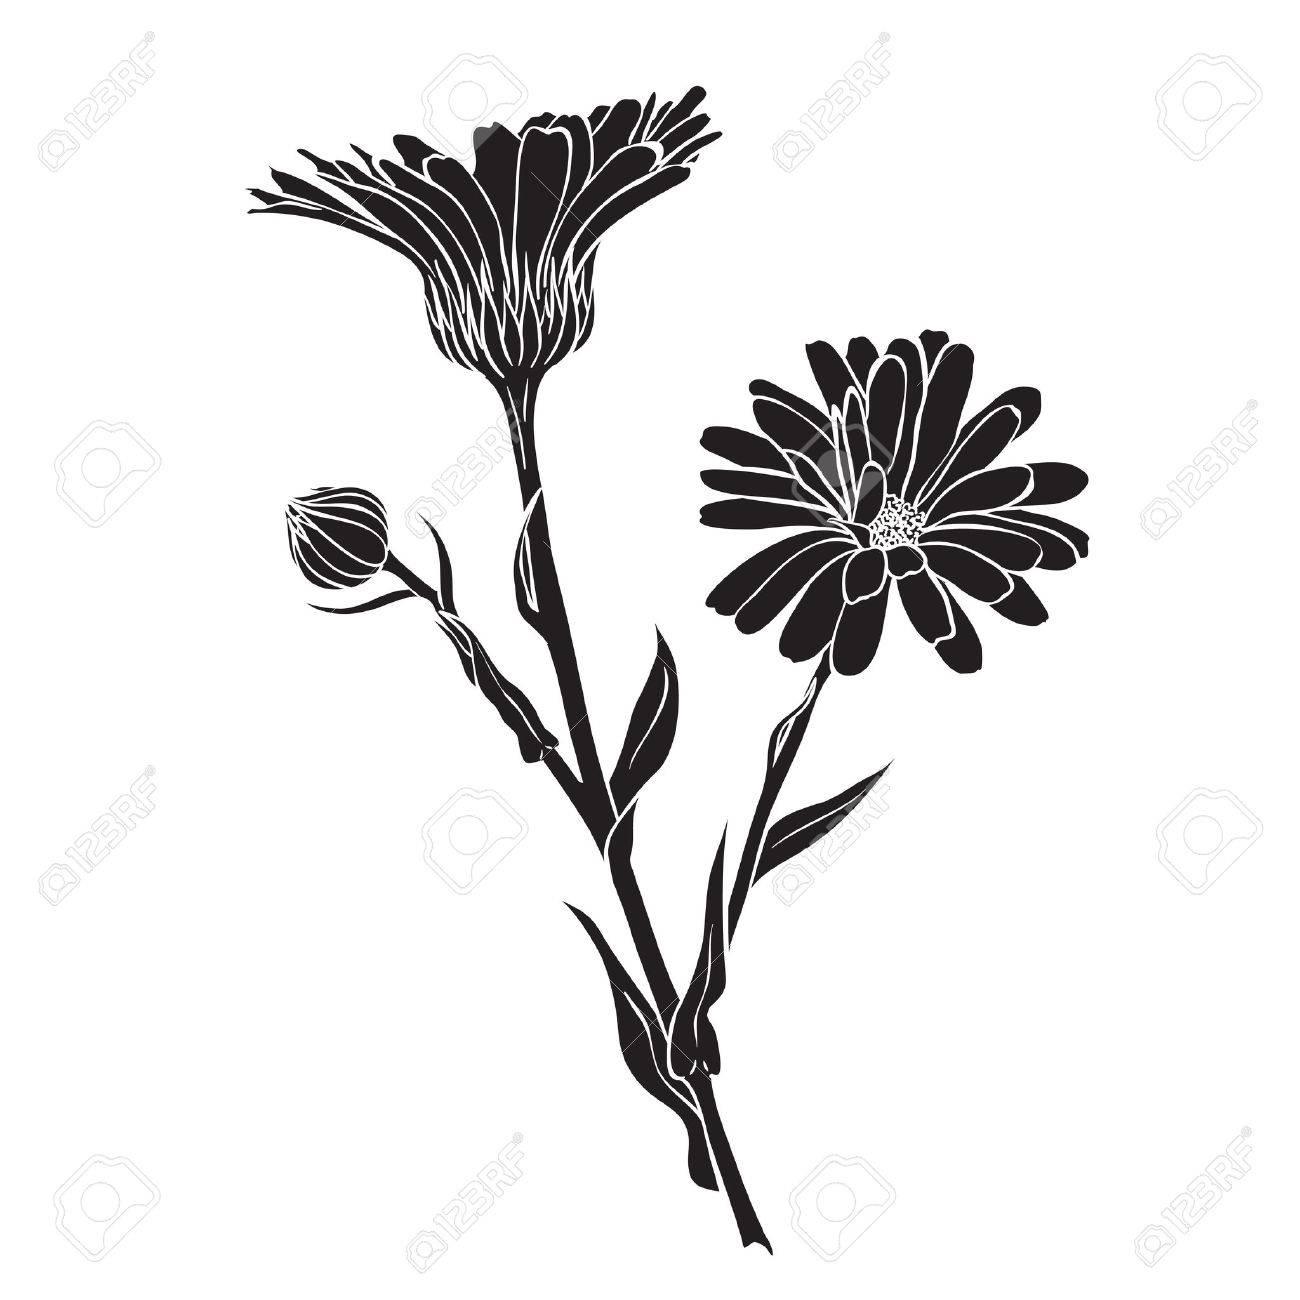 Hand drawn flowers - Calendula officinalis or pot marigold silhouette - 36312825